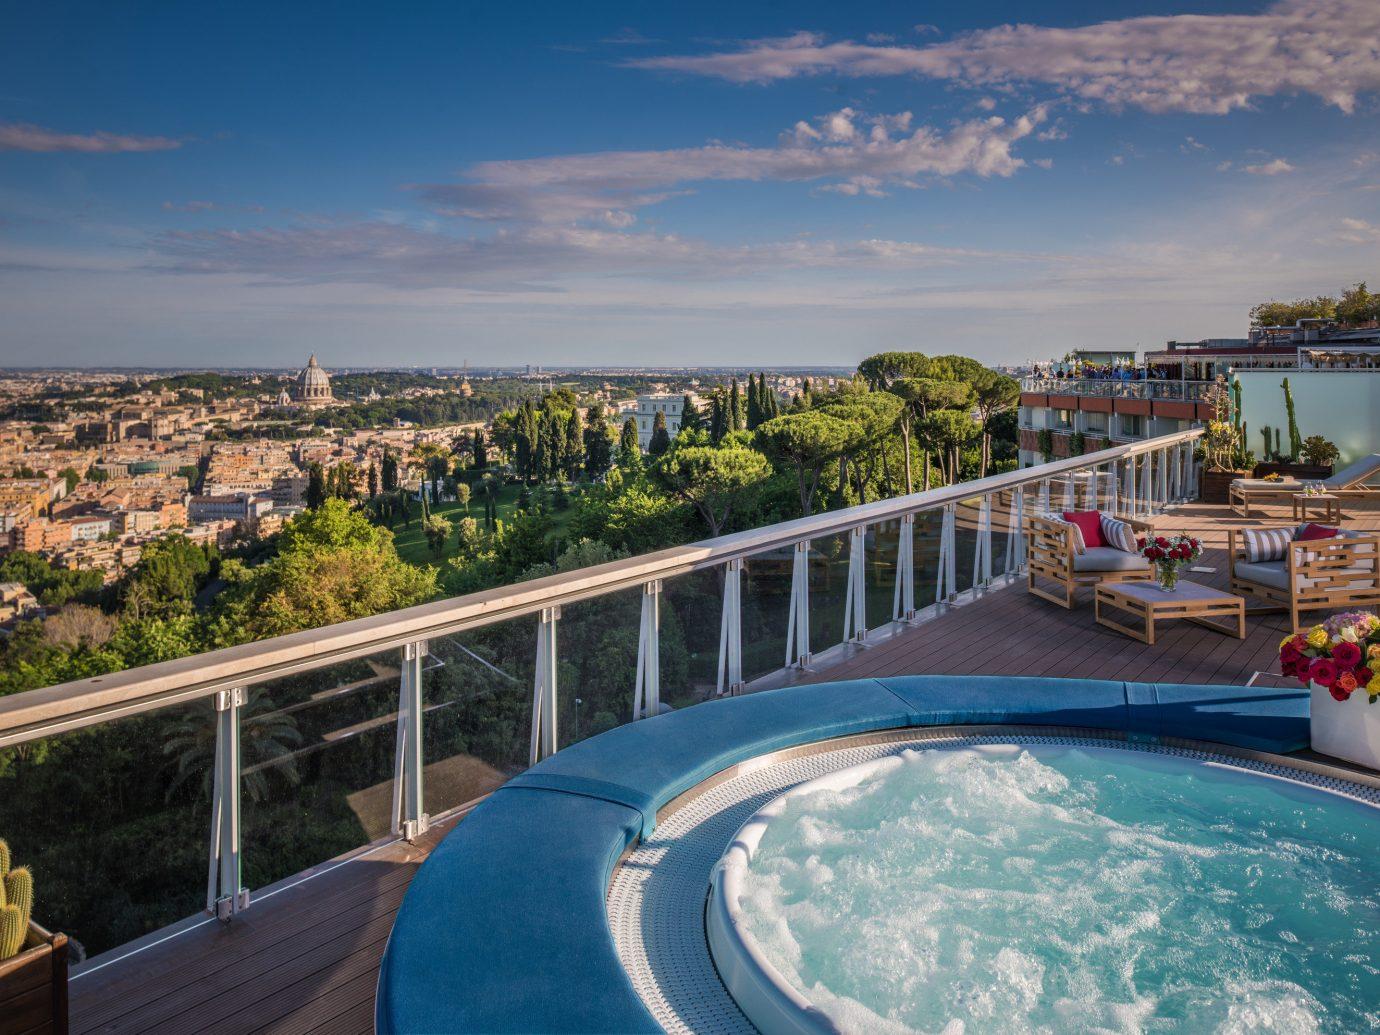 Hotels Luxury Travel sky outdoor property swimming pool building vacation estate Resort Sea real estate bay condominium Villa overlooking